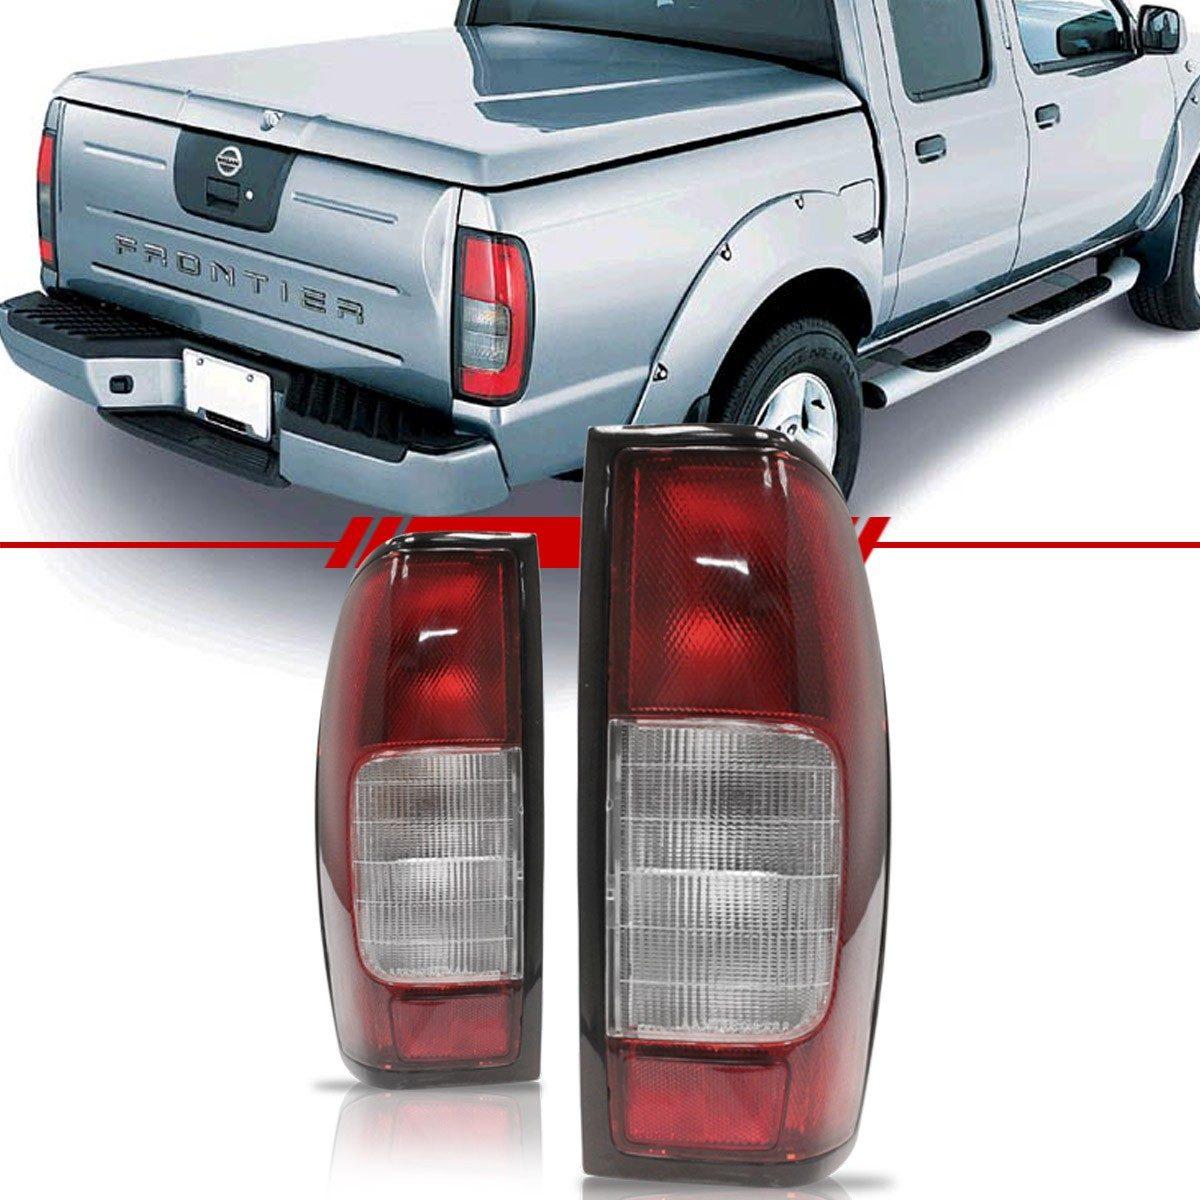 2001 Nissan Frontier King Cab Camshaft: Lanterna Traseira Nissan Frontier 98 99 2000 2001 2002